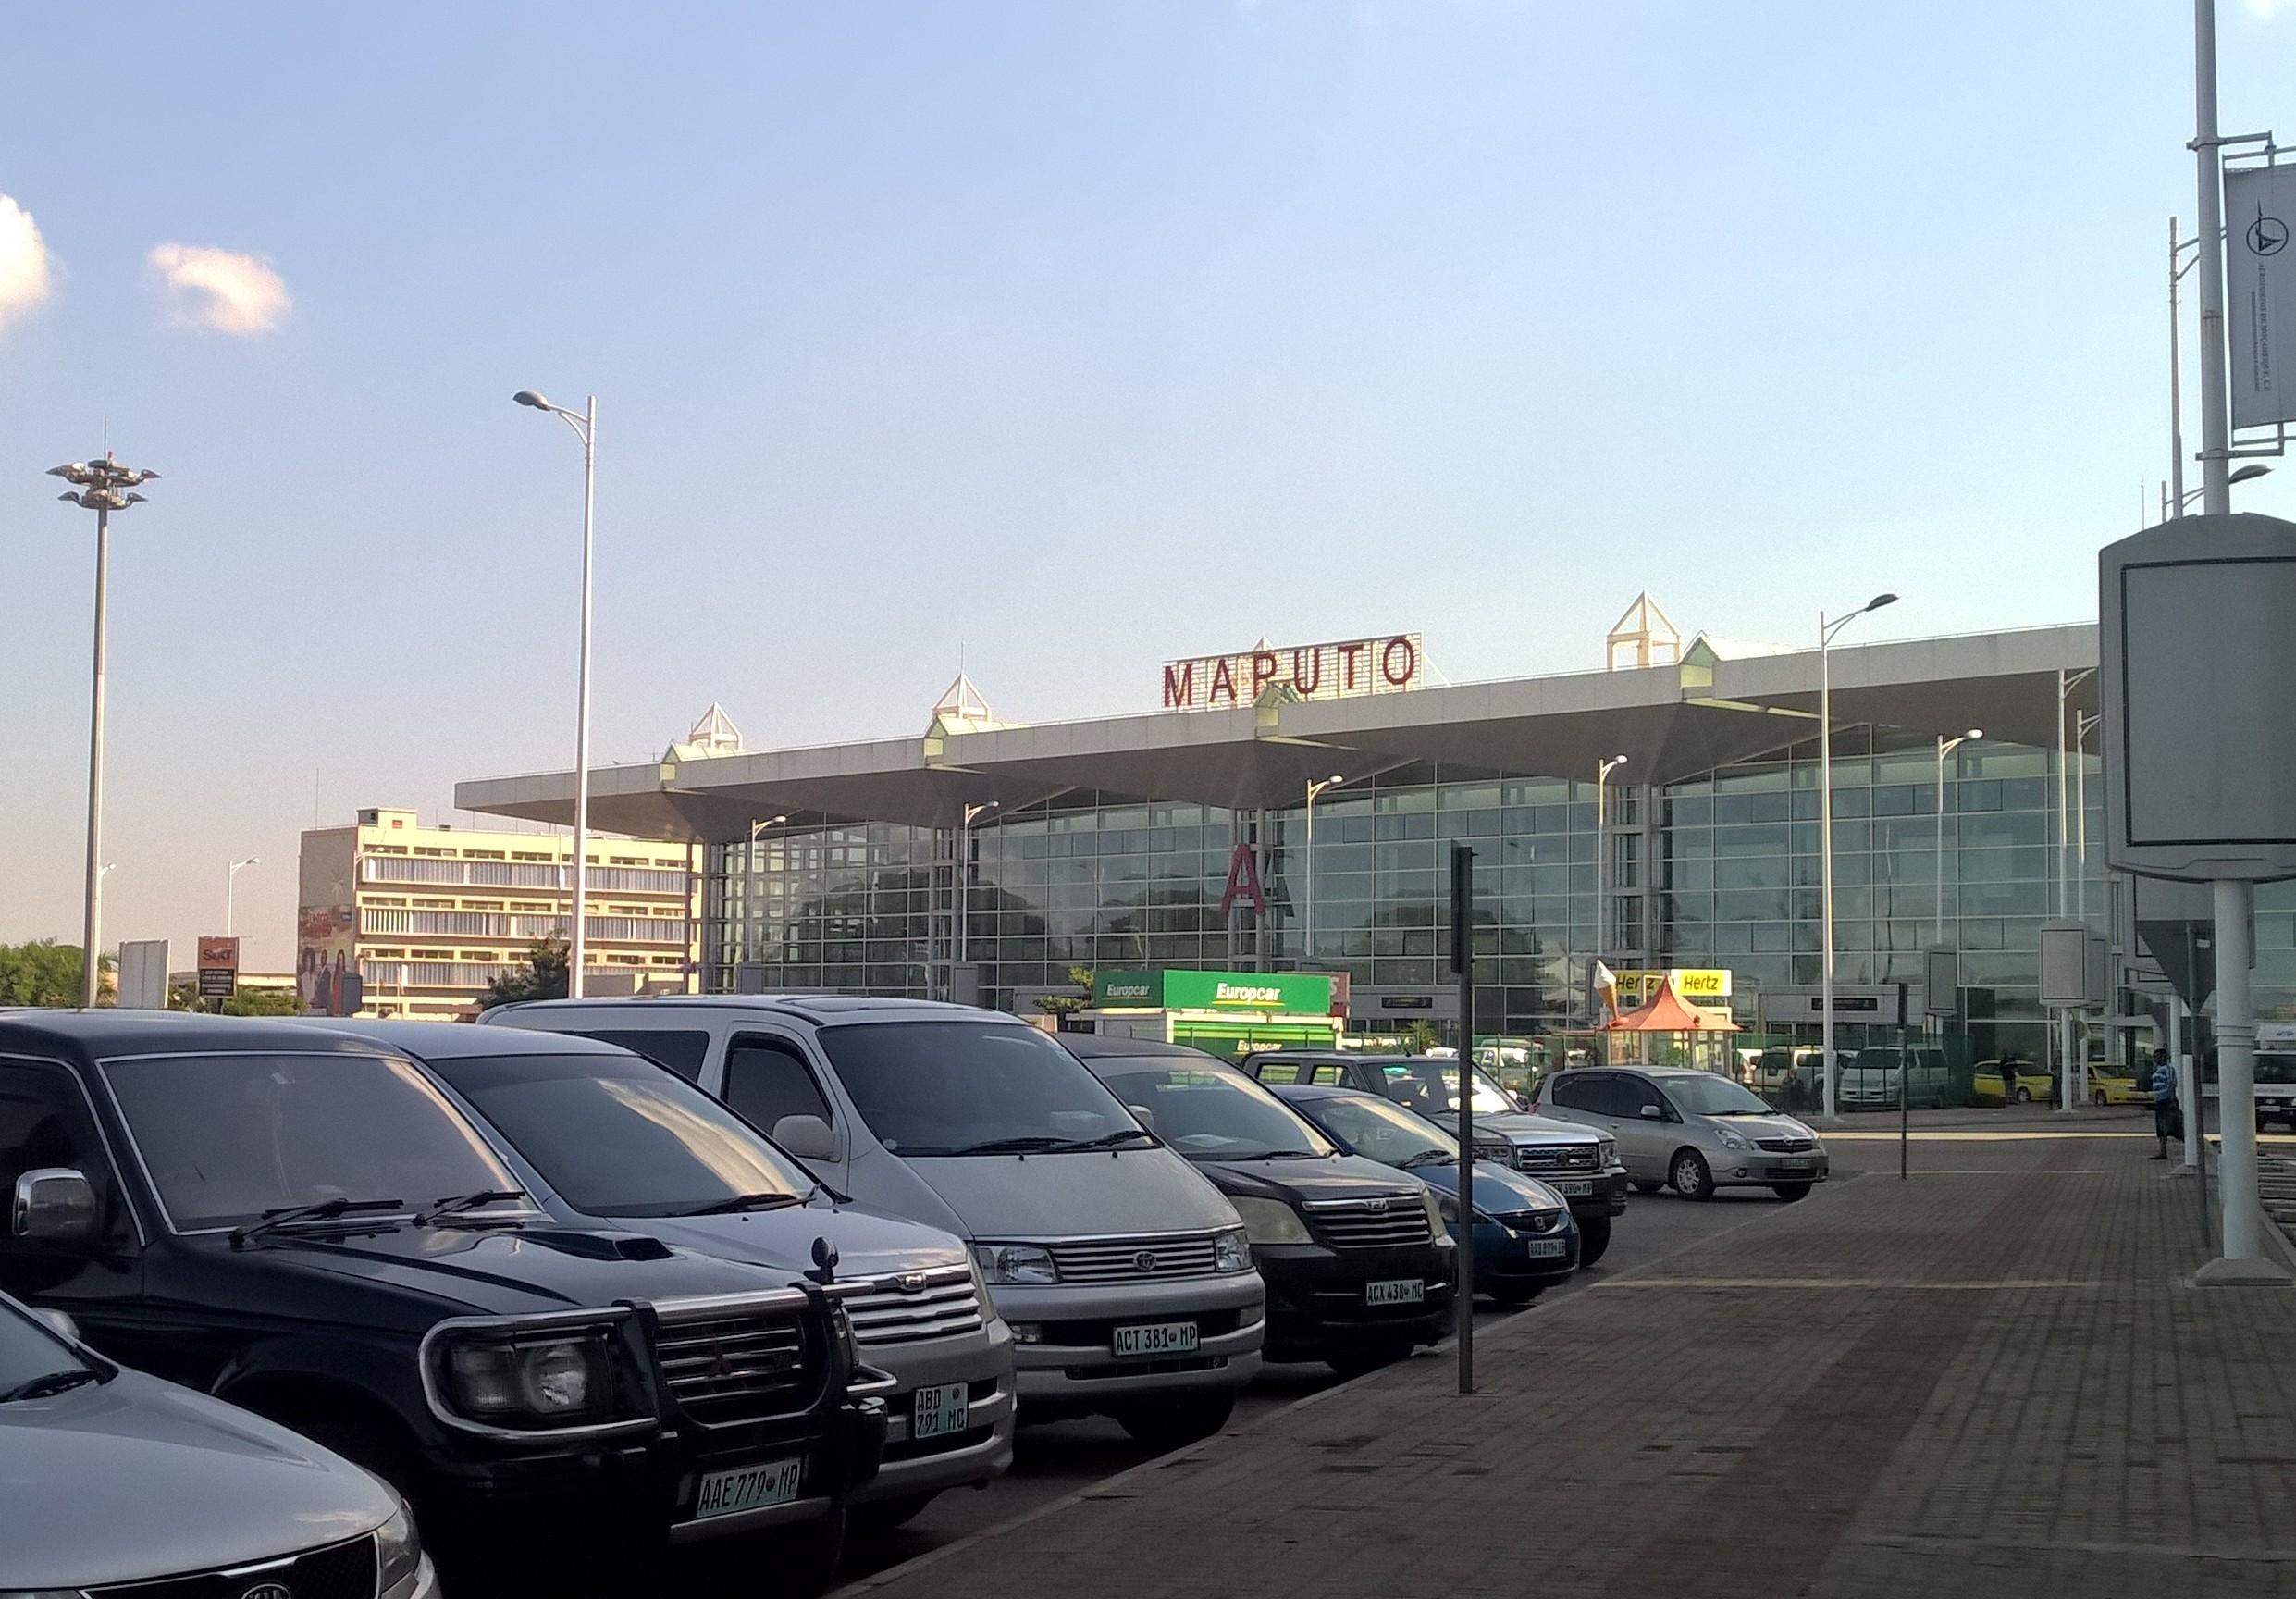 1 Arrival in Maputo